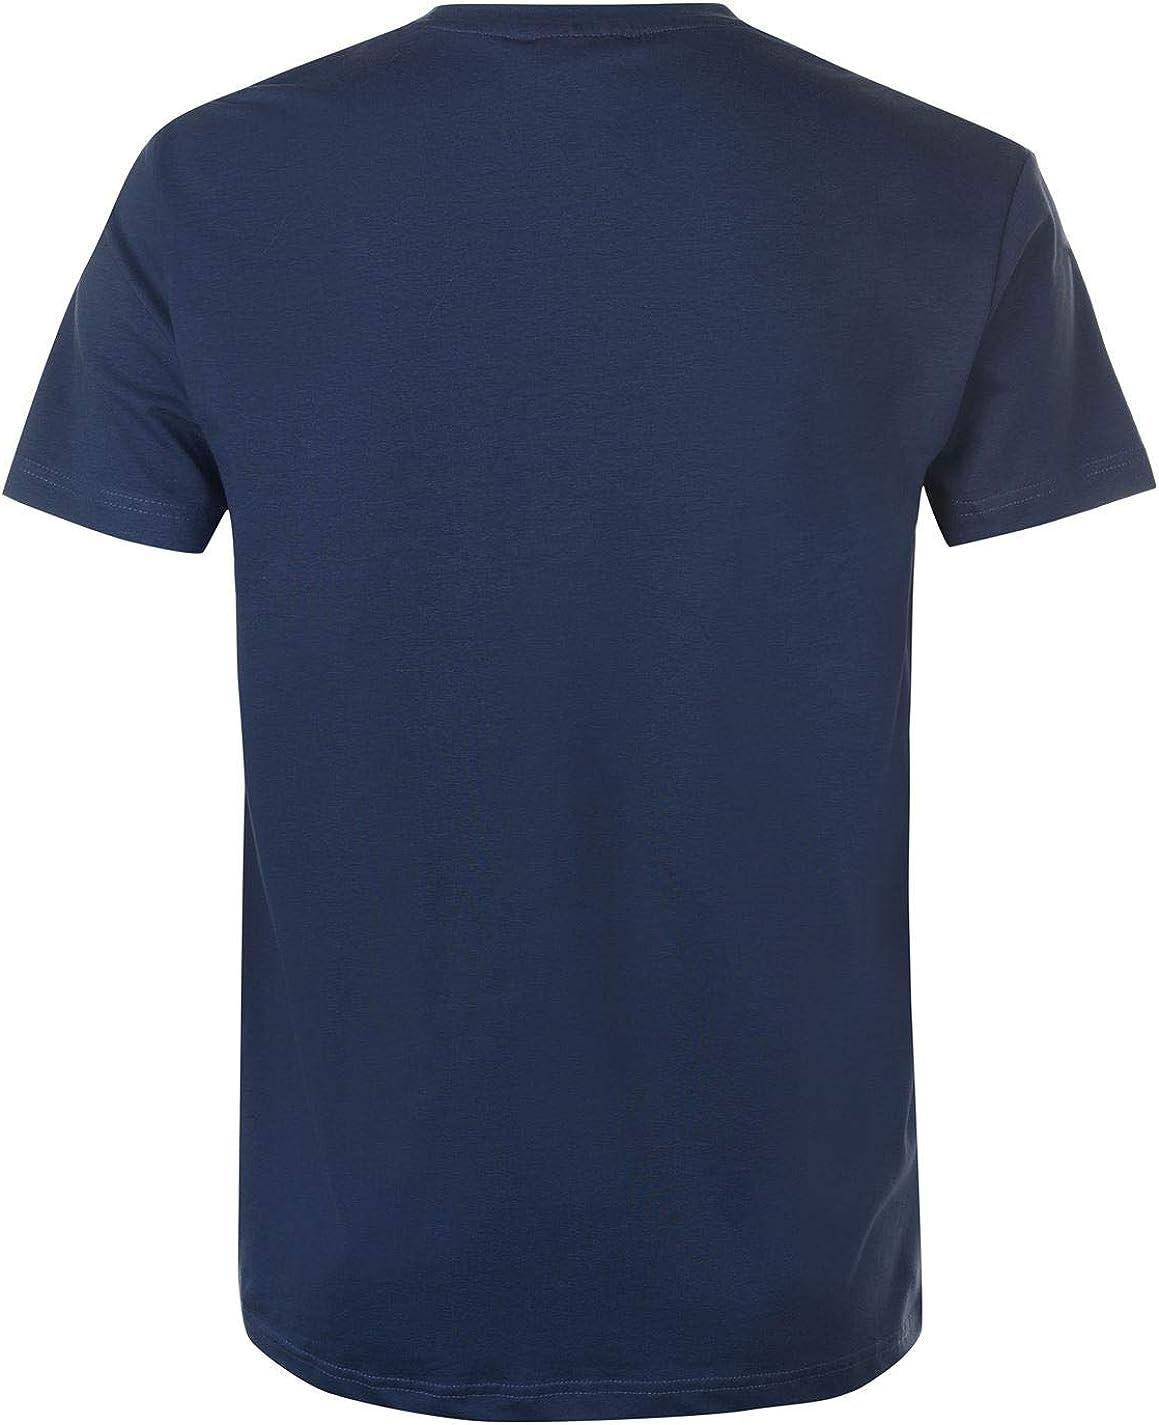 Karrimor Organic Logo T-Shirt Mens Black Sportswear Top Tee Shirt